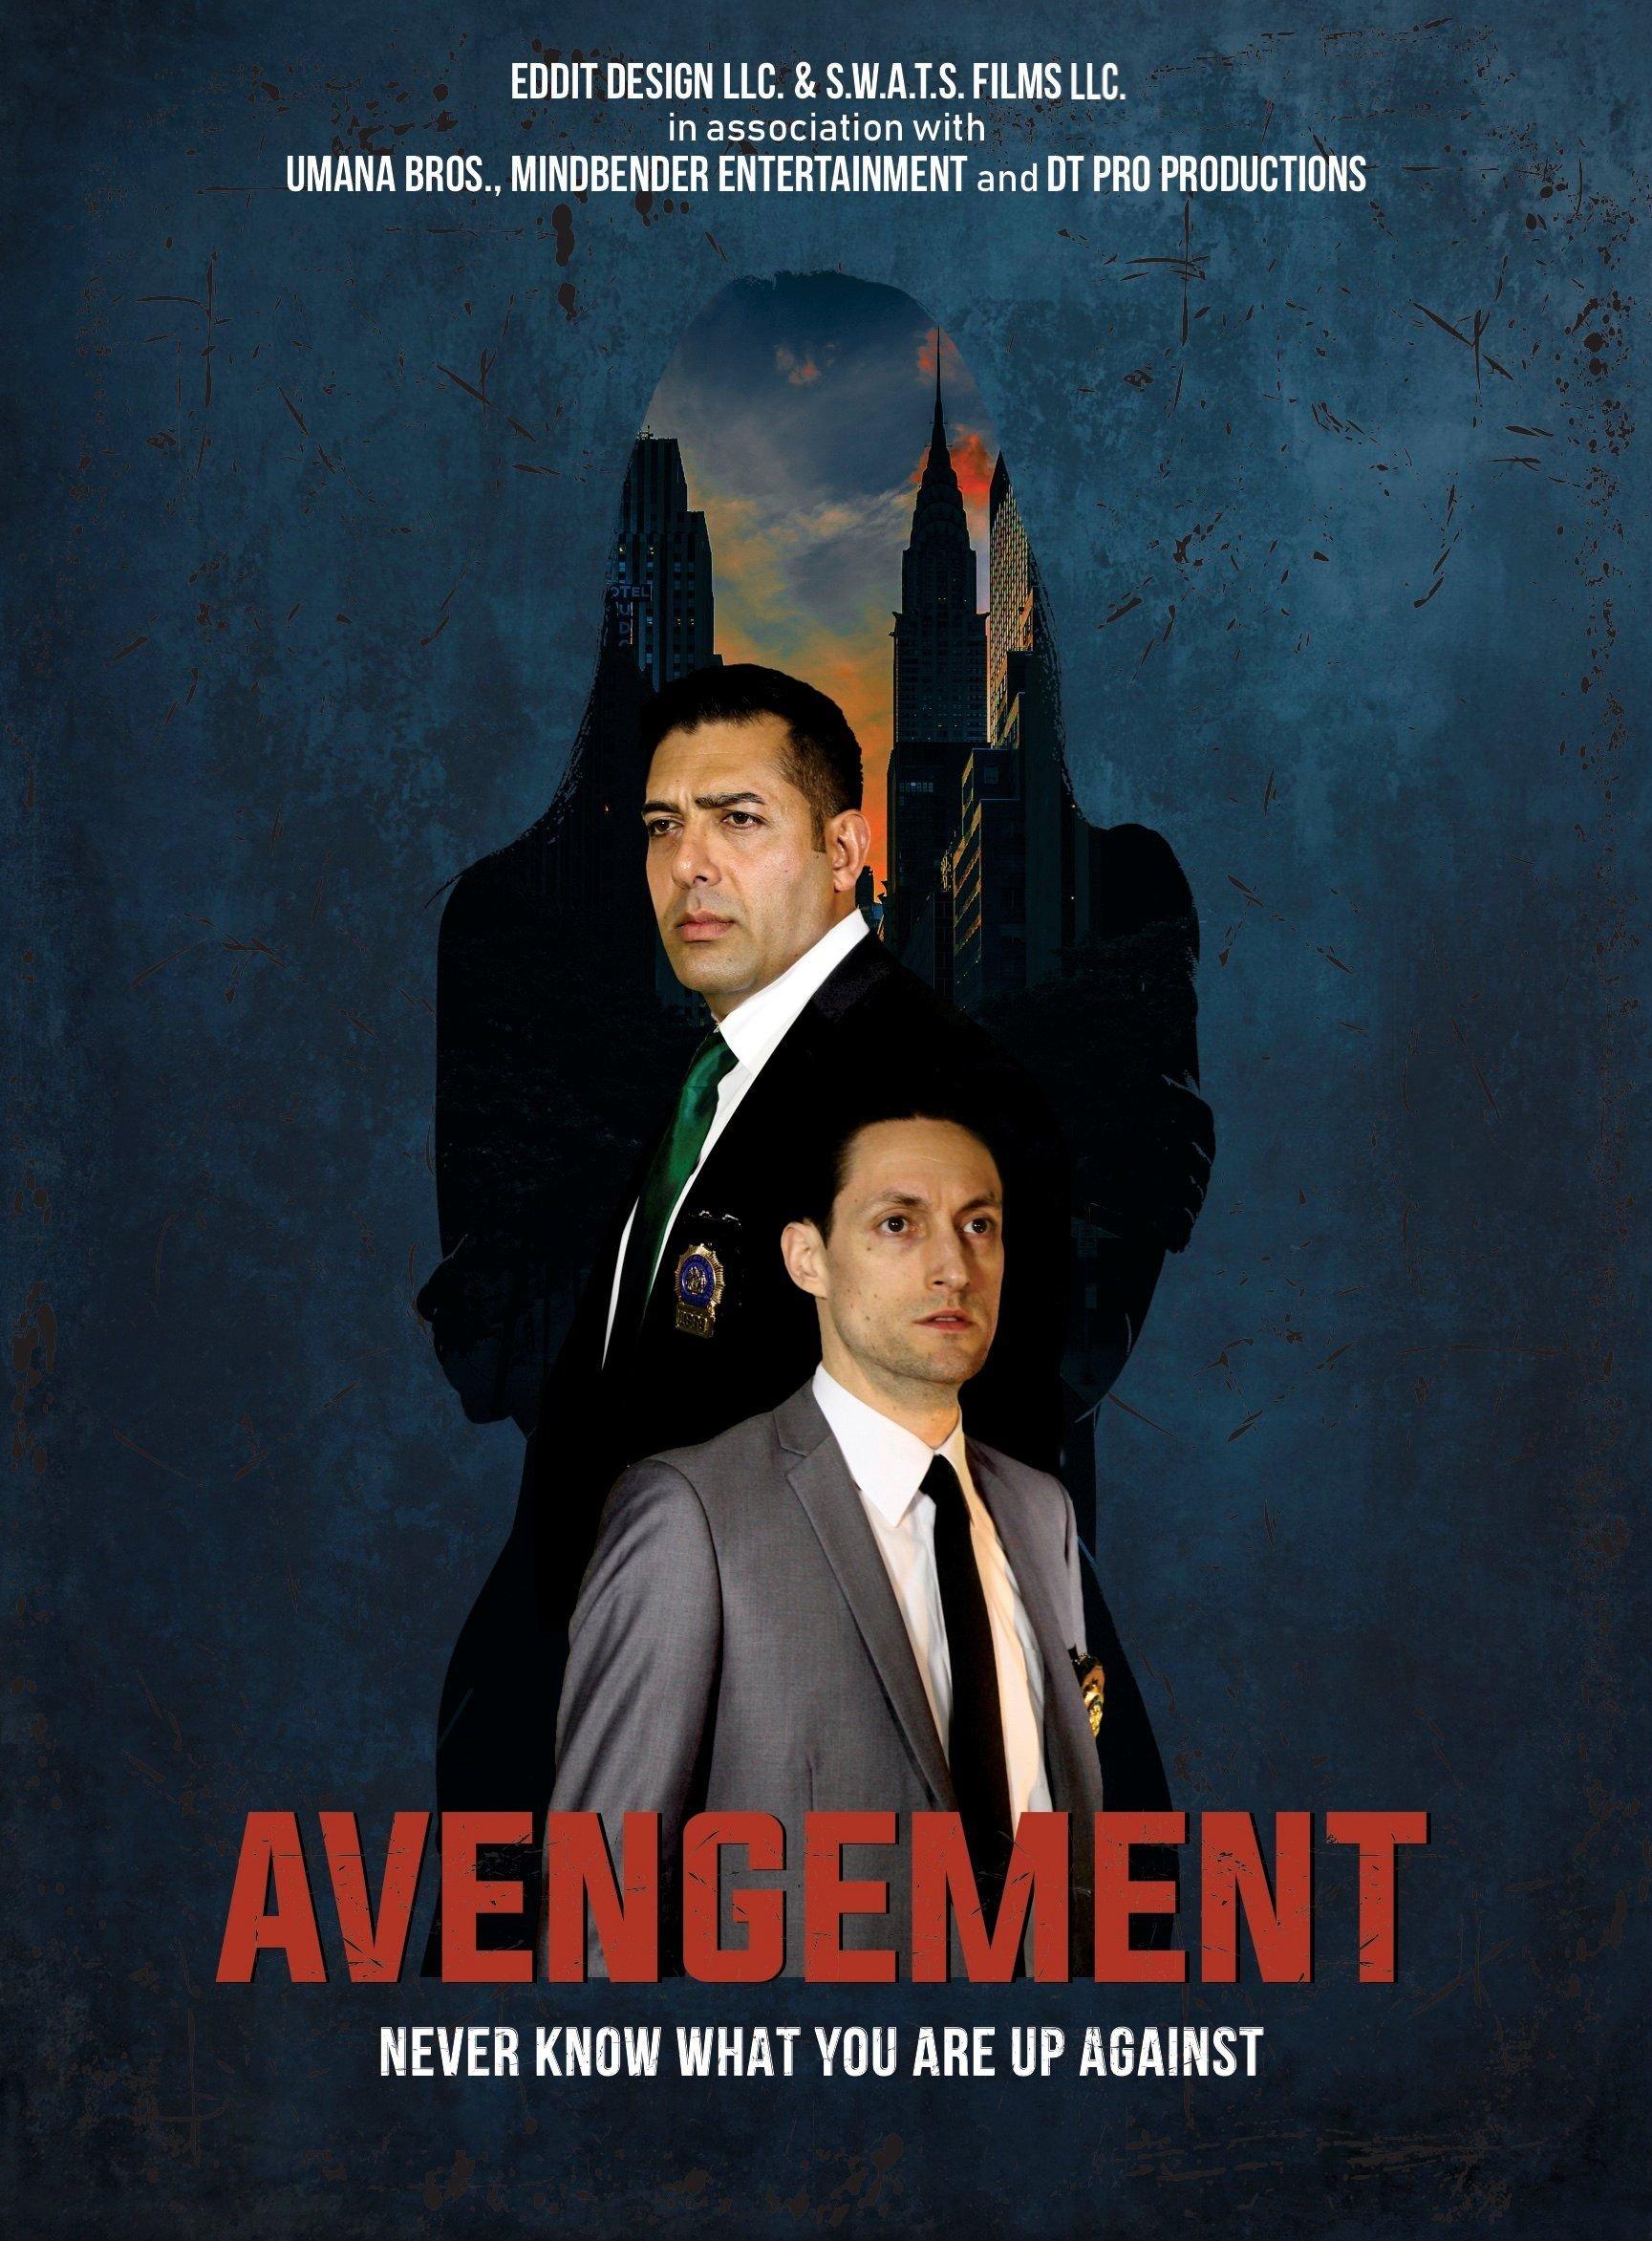 Avengement (2019) - IMDb